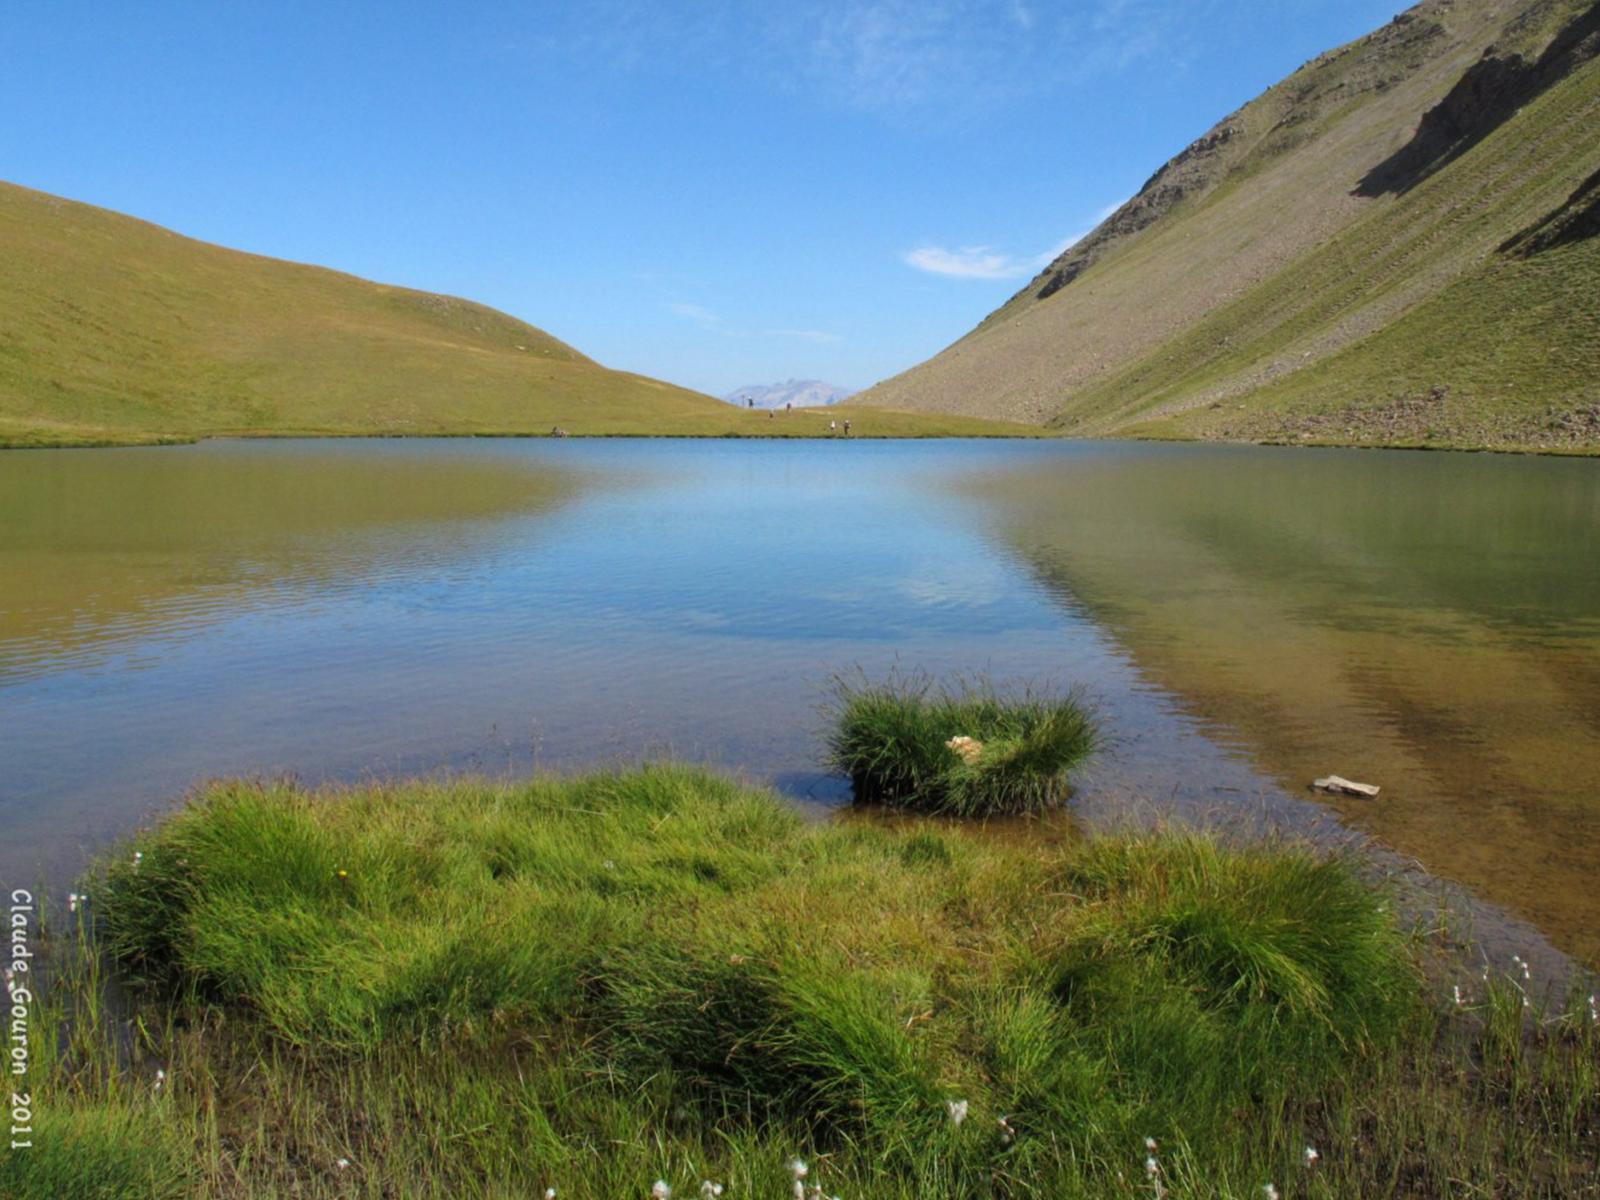 Lac des terres pleines Jausiers